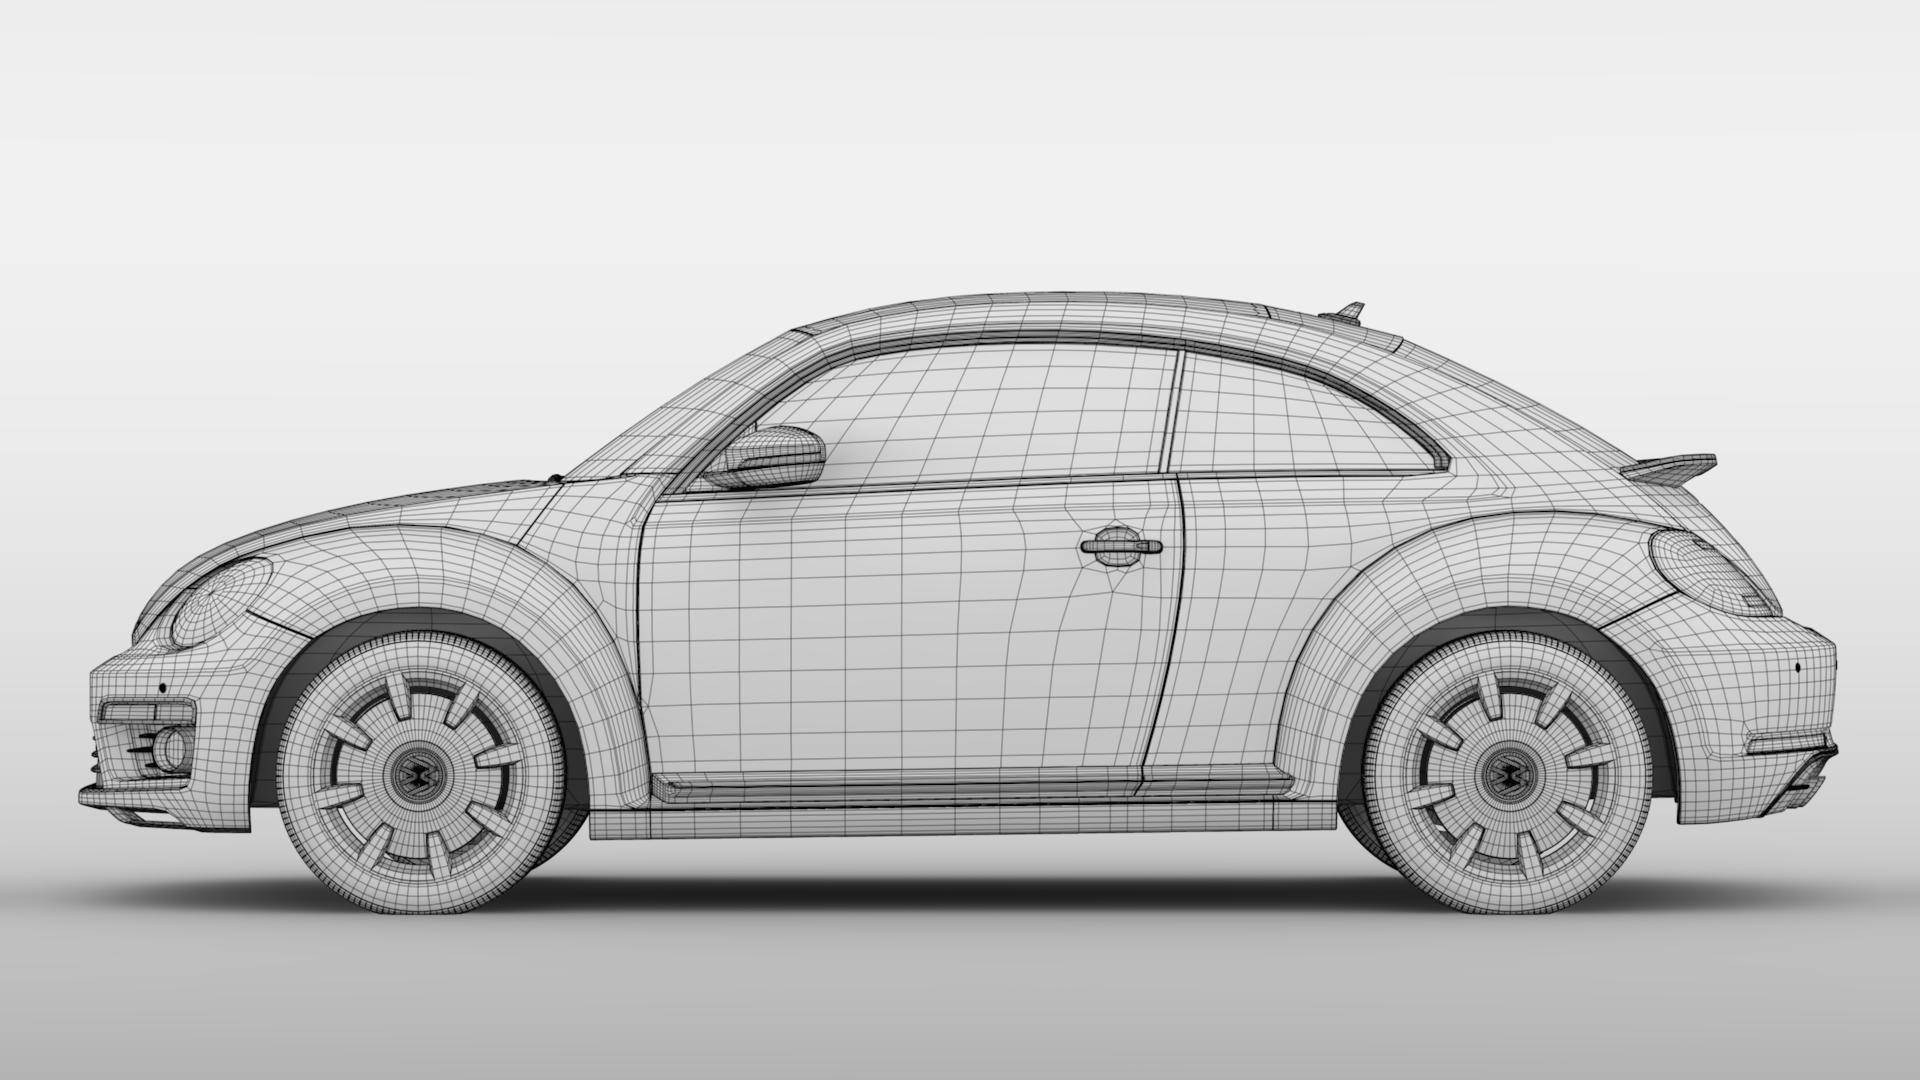 vw beetle turbo 2017 3d model 3ds max fbx c4d lwo ma mb hrc xsi obj 221678